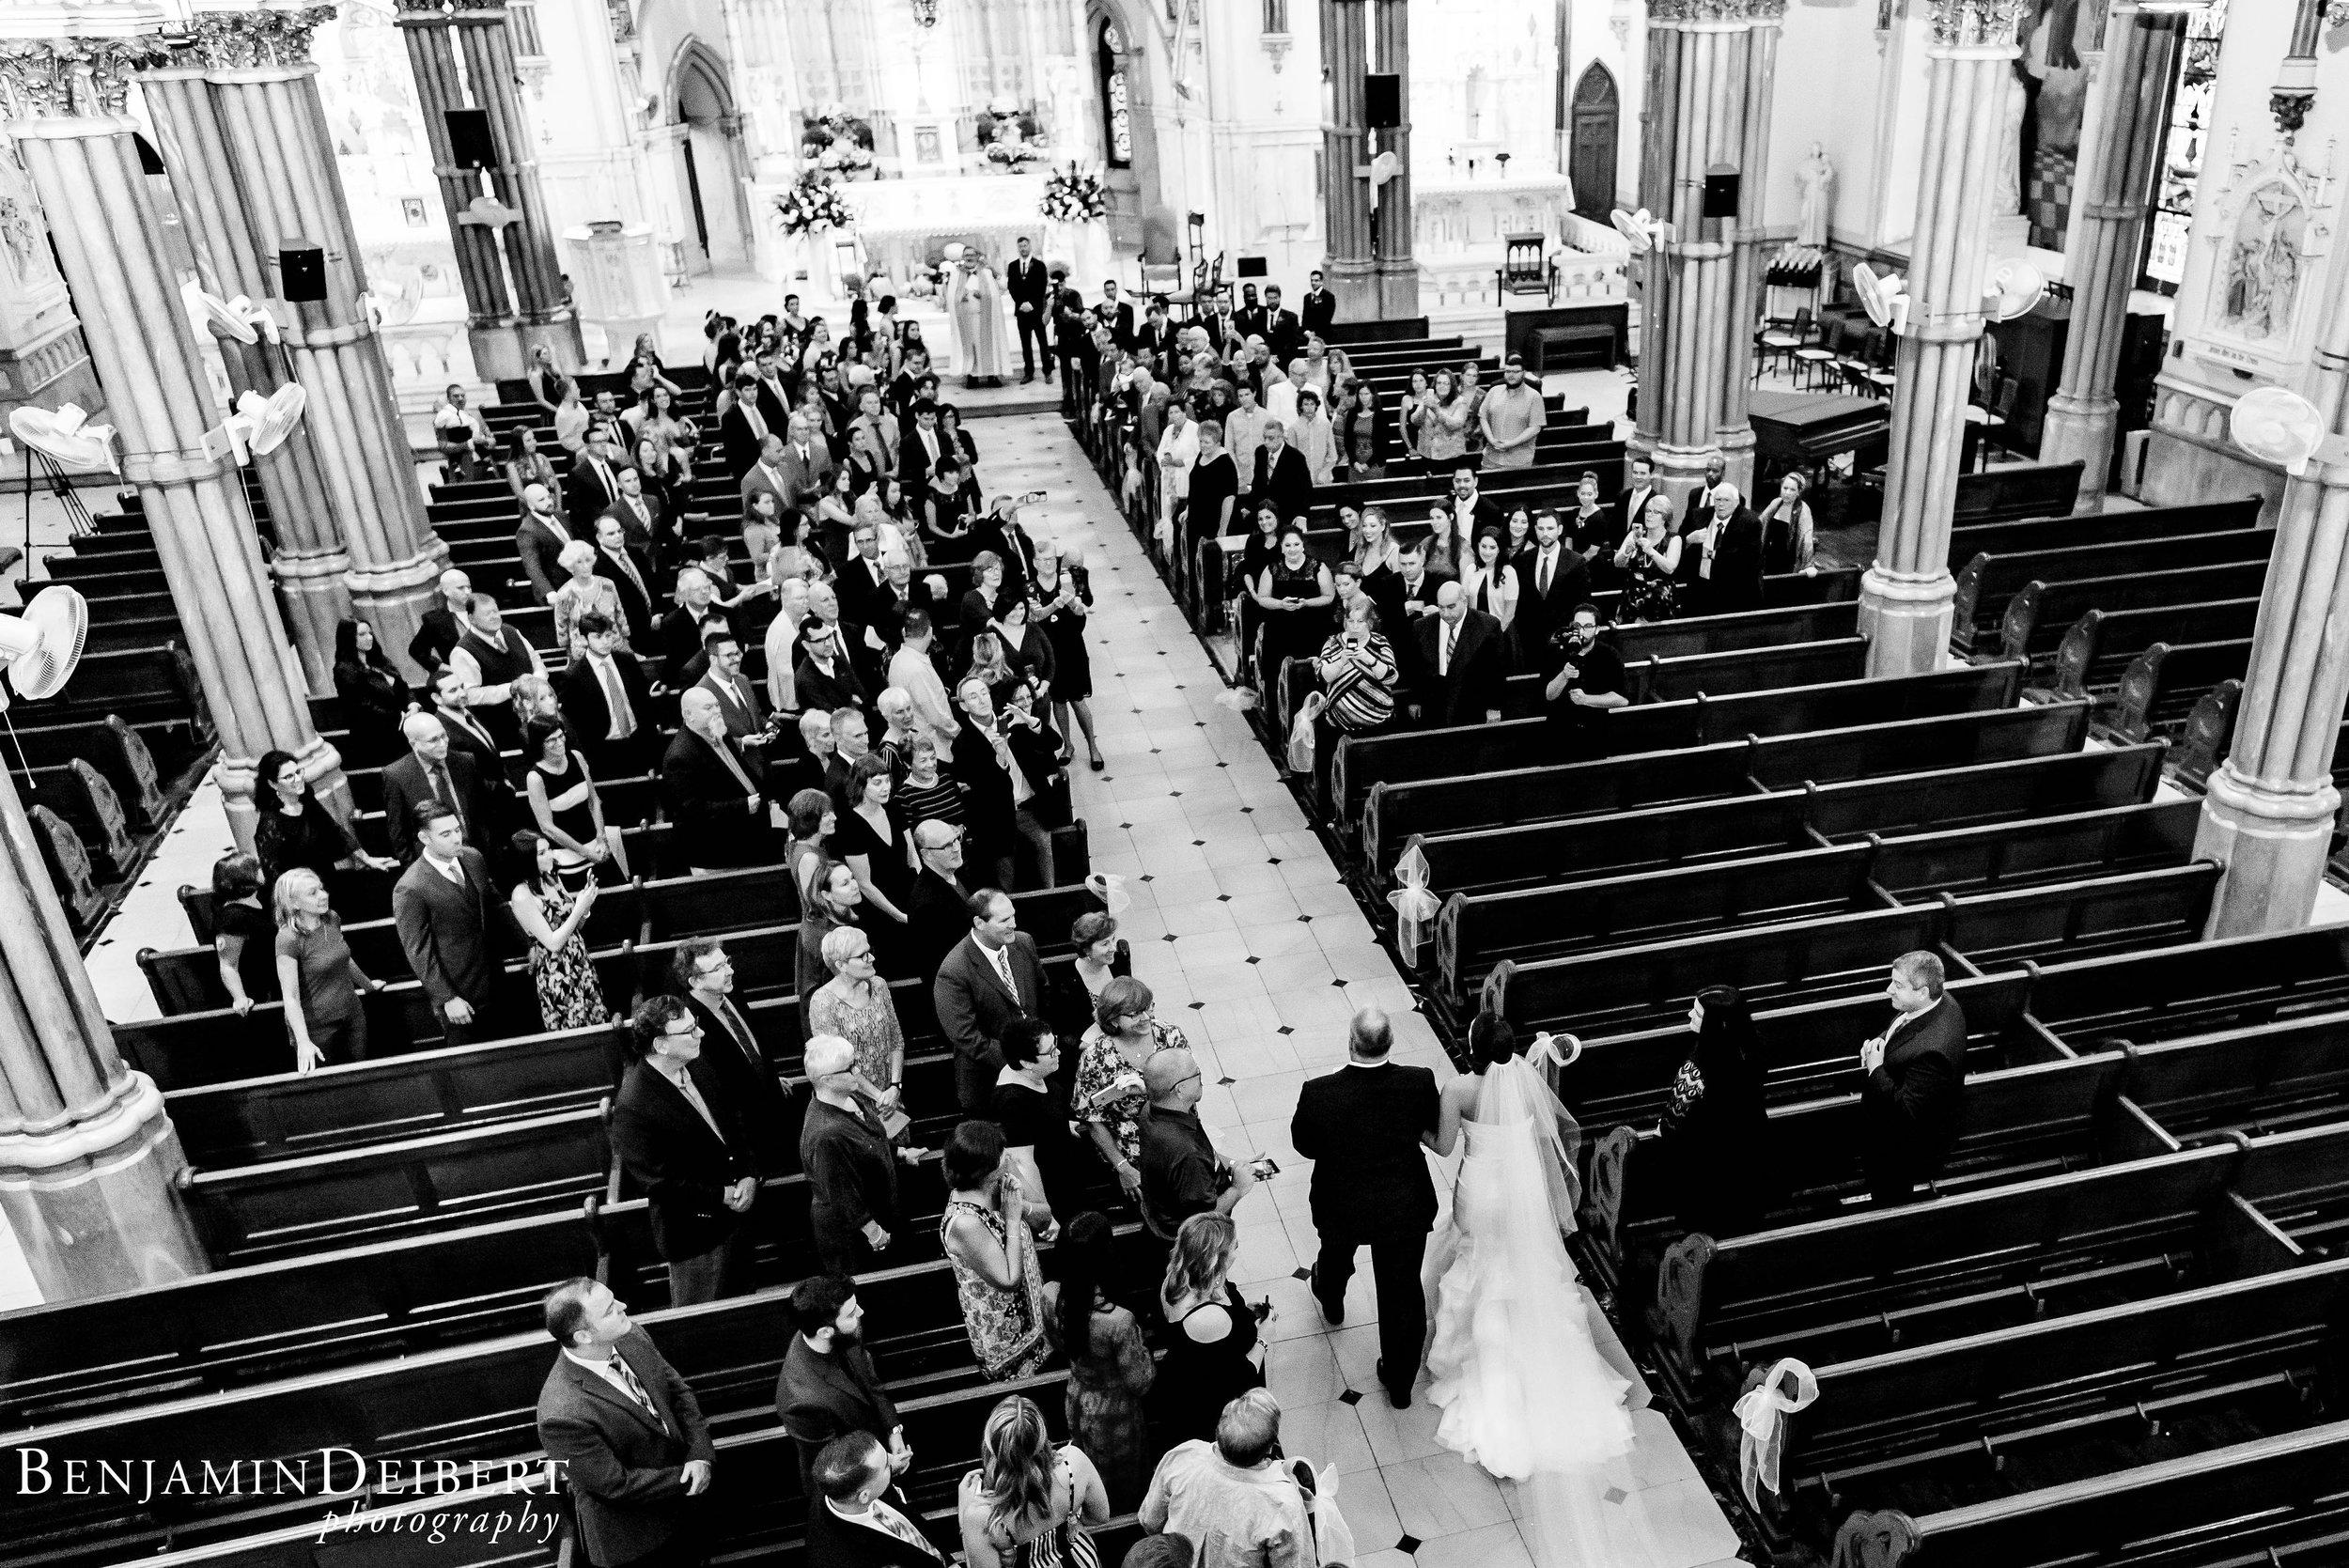 TeghanandChris_BridgemensBallroom_Wedding-43.jpg